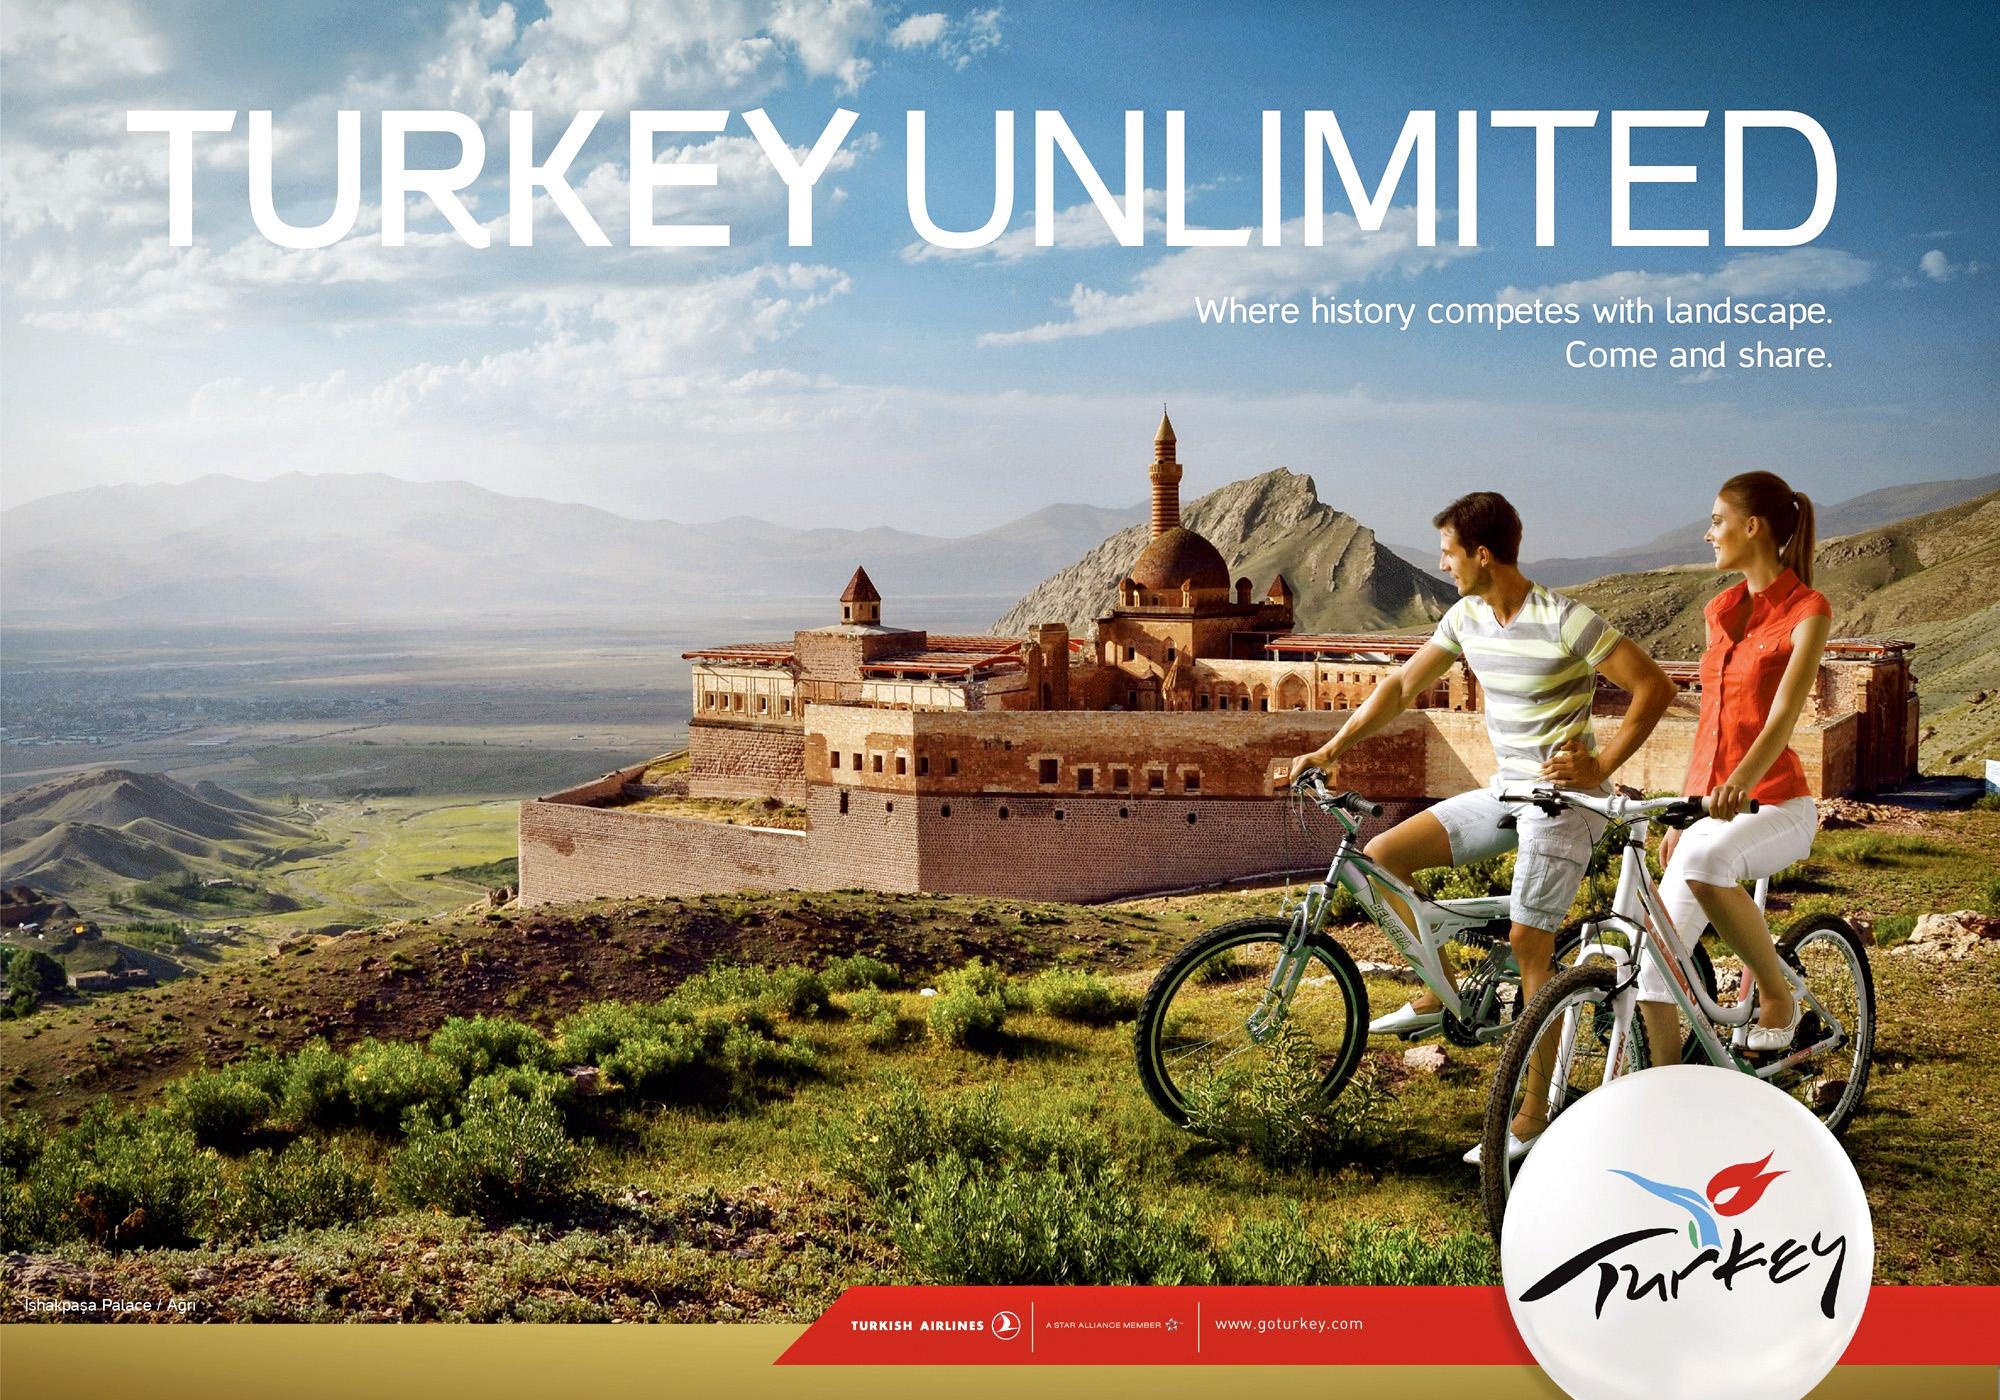 Turkey_2013_9